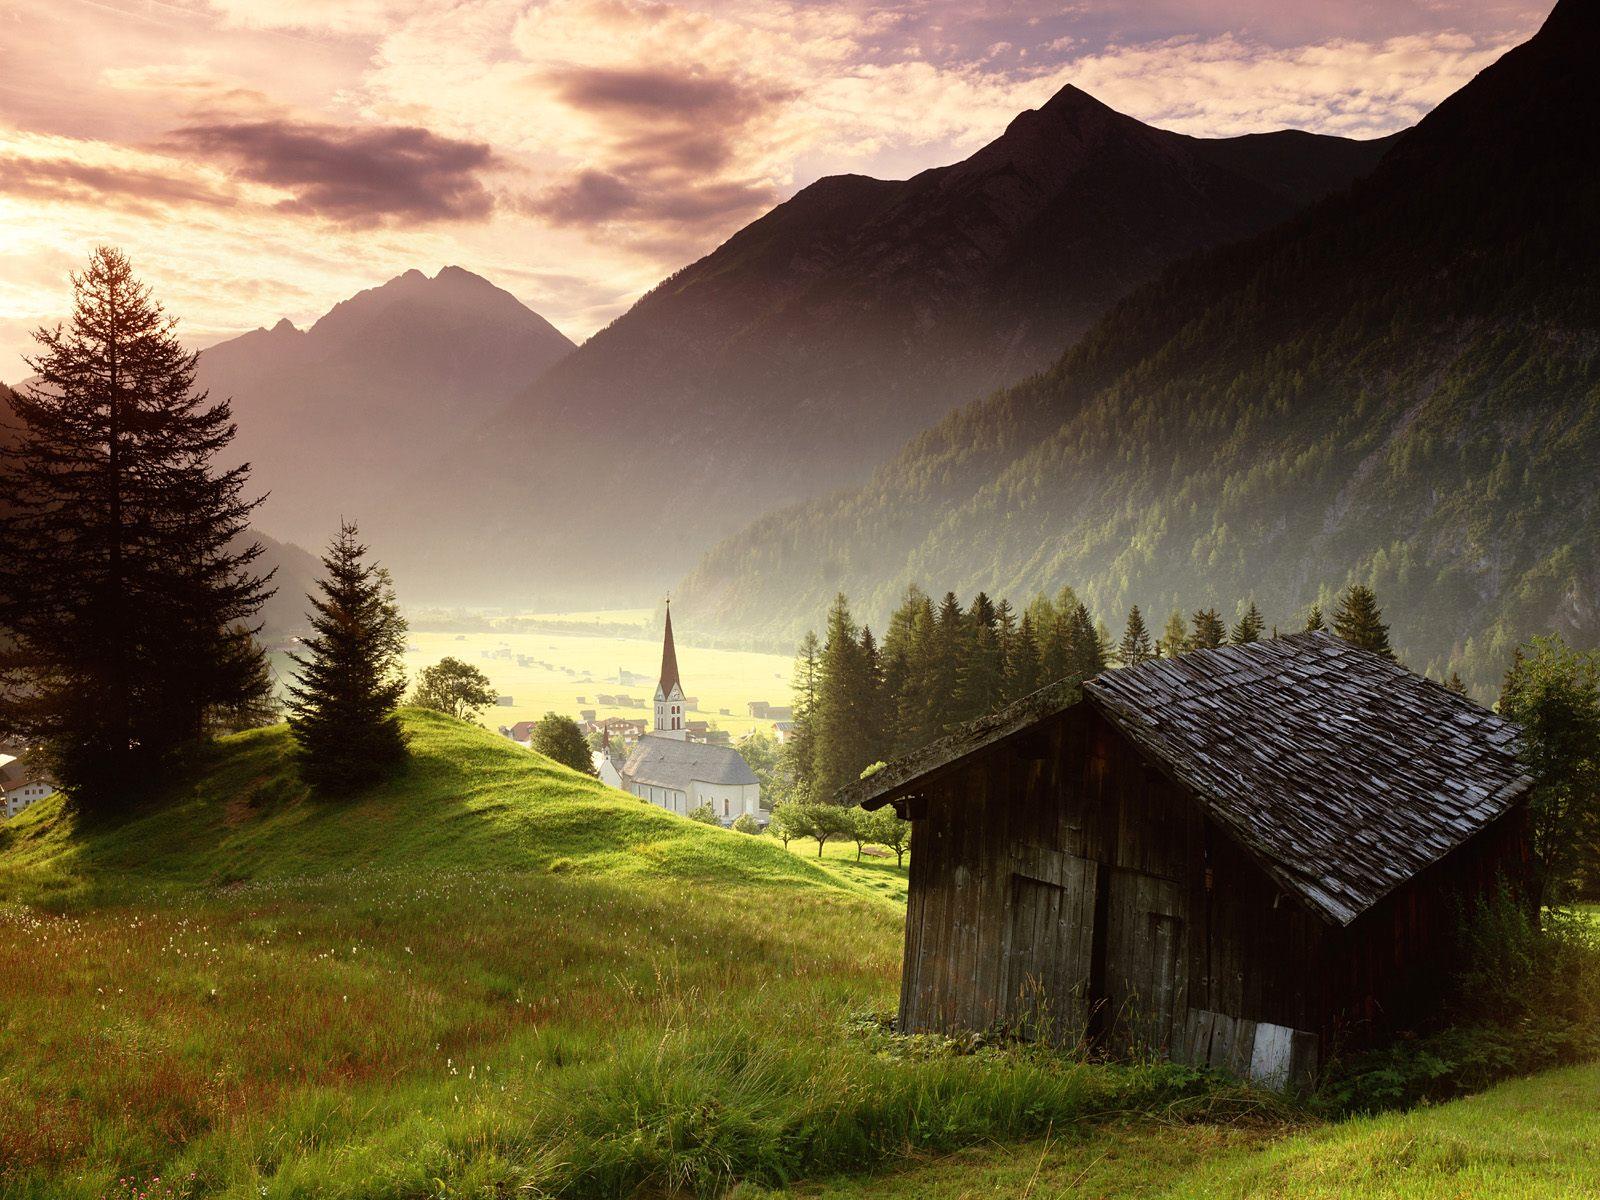 Tyrol - Full Hd Wallpapers 1080p Widescreen Nature - HD Wallpaper